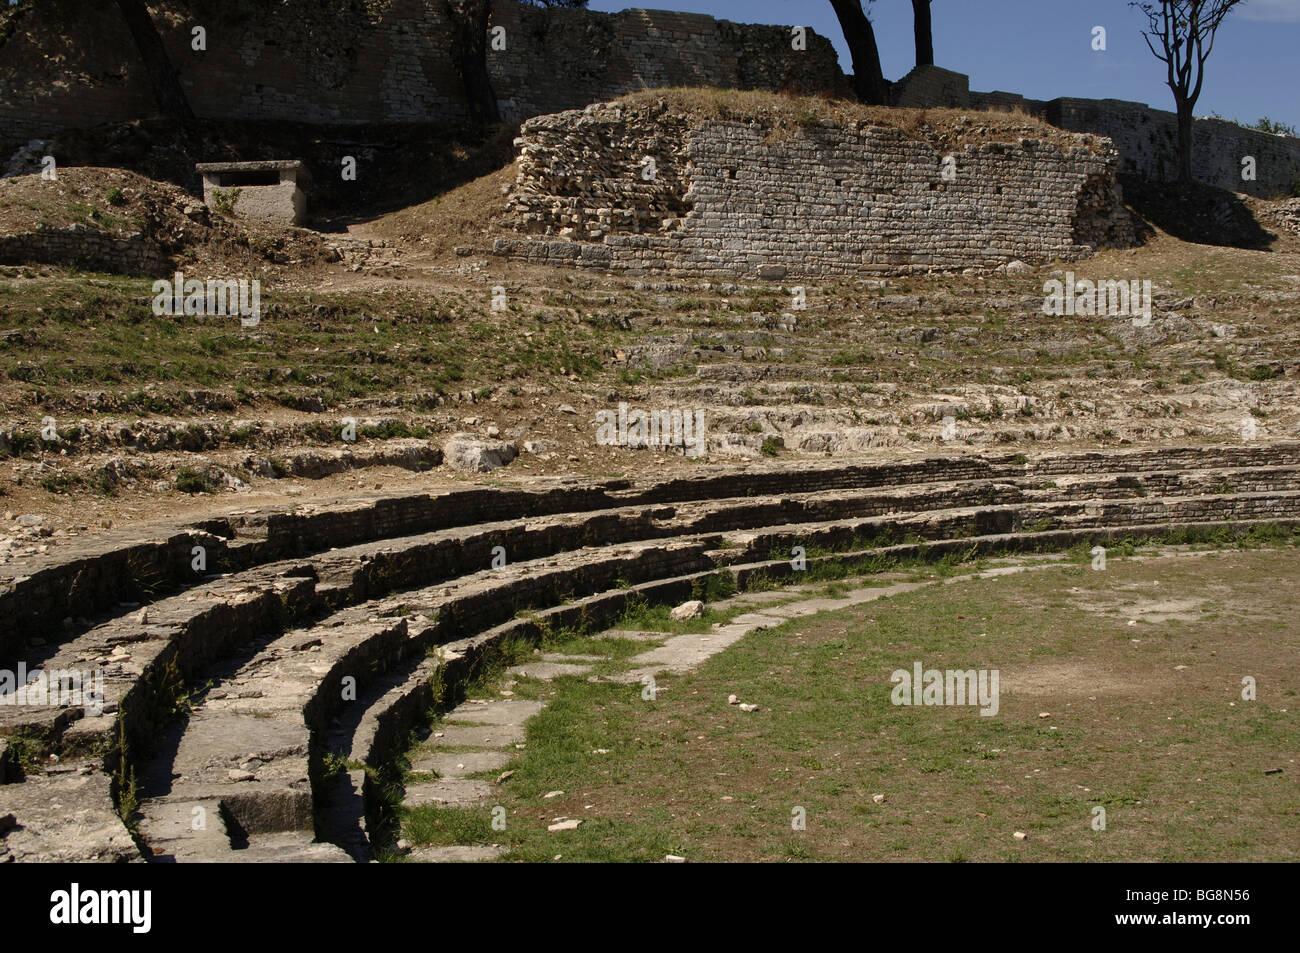 ROMAN ART. CROATIA. Roman Theater, built in the first or second century A.D. Pula. Istrian Peninsula. - Stock Image